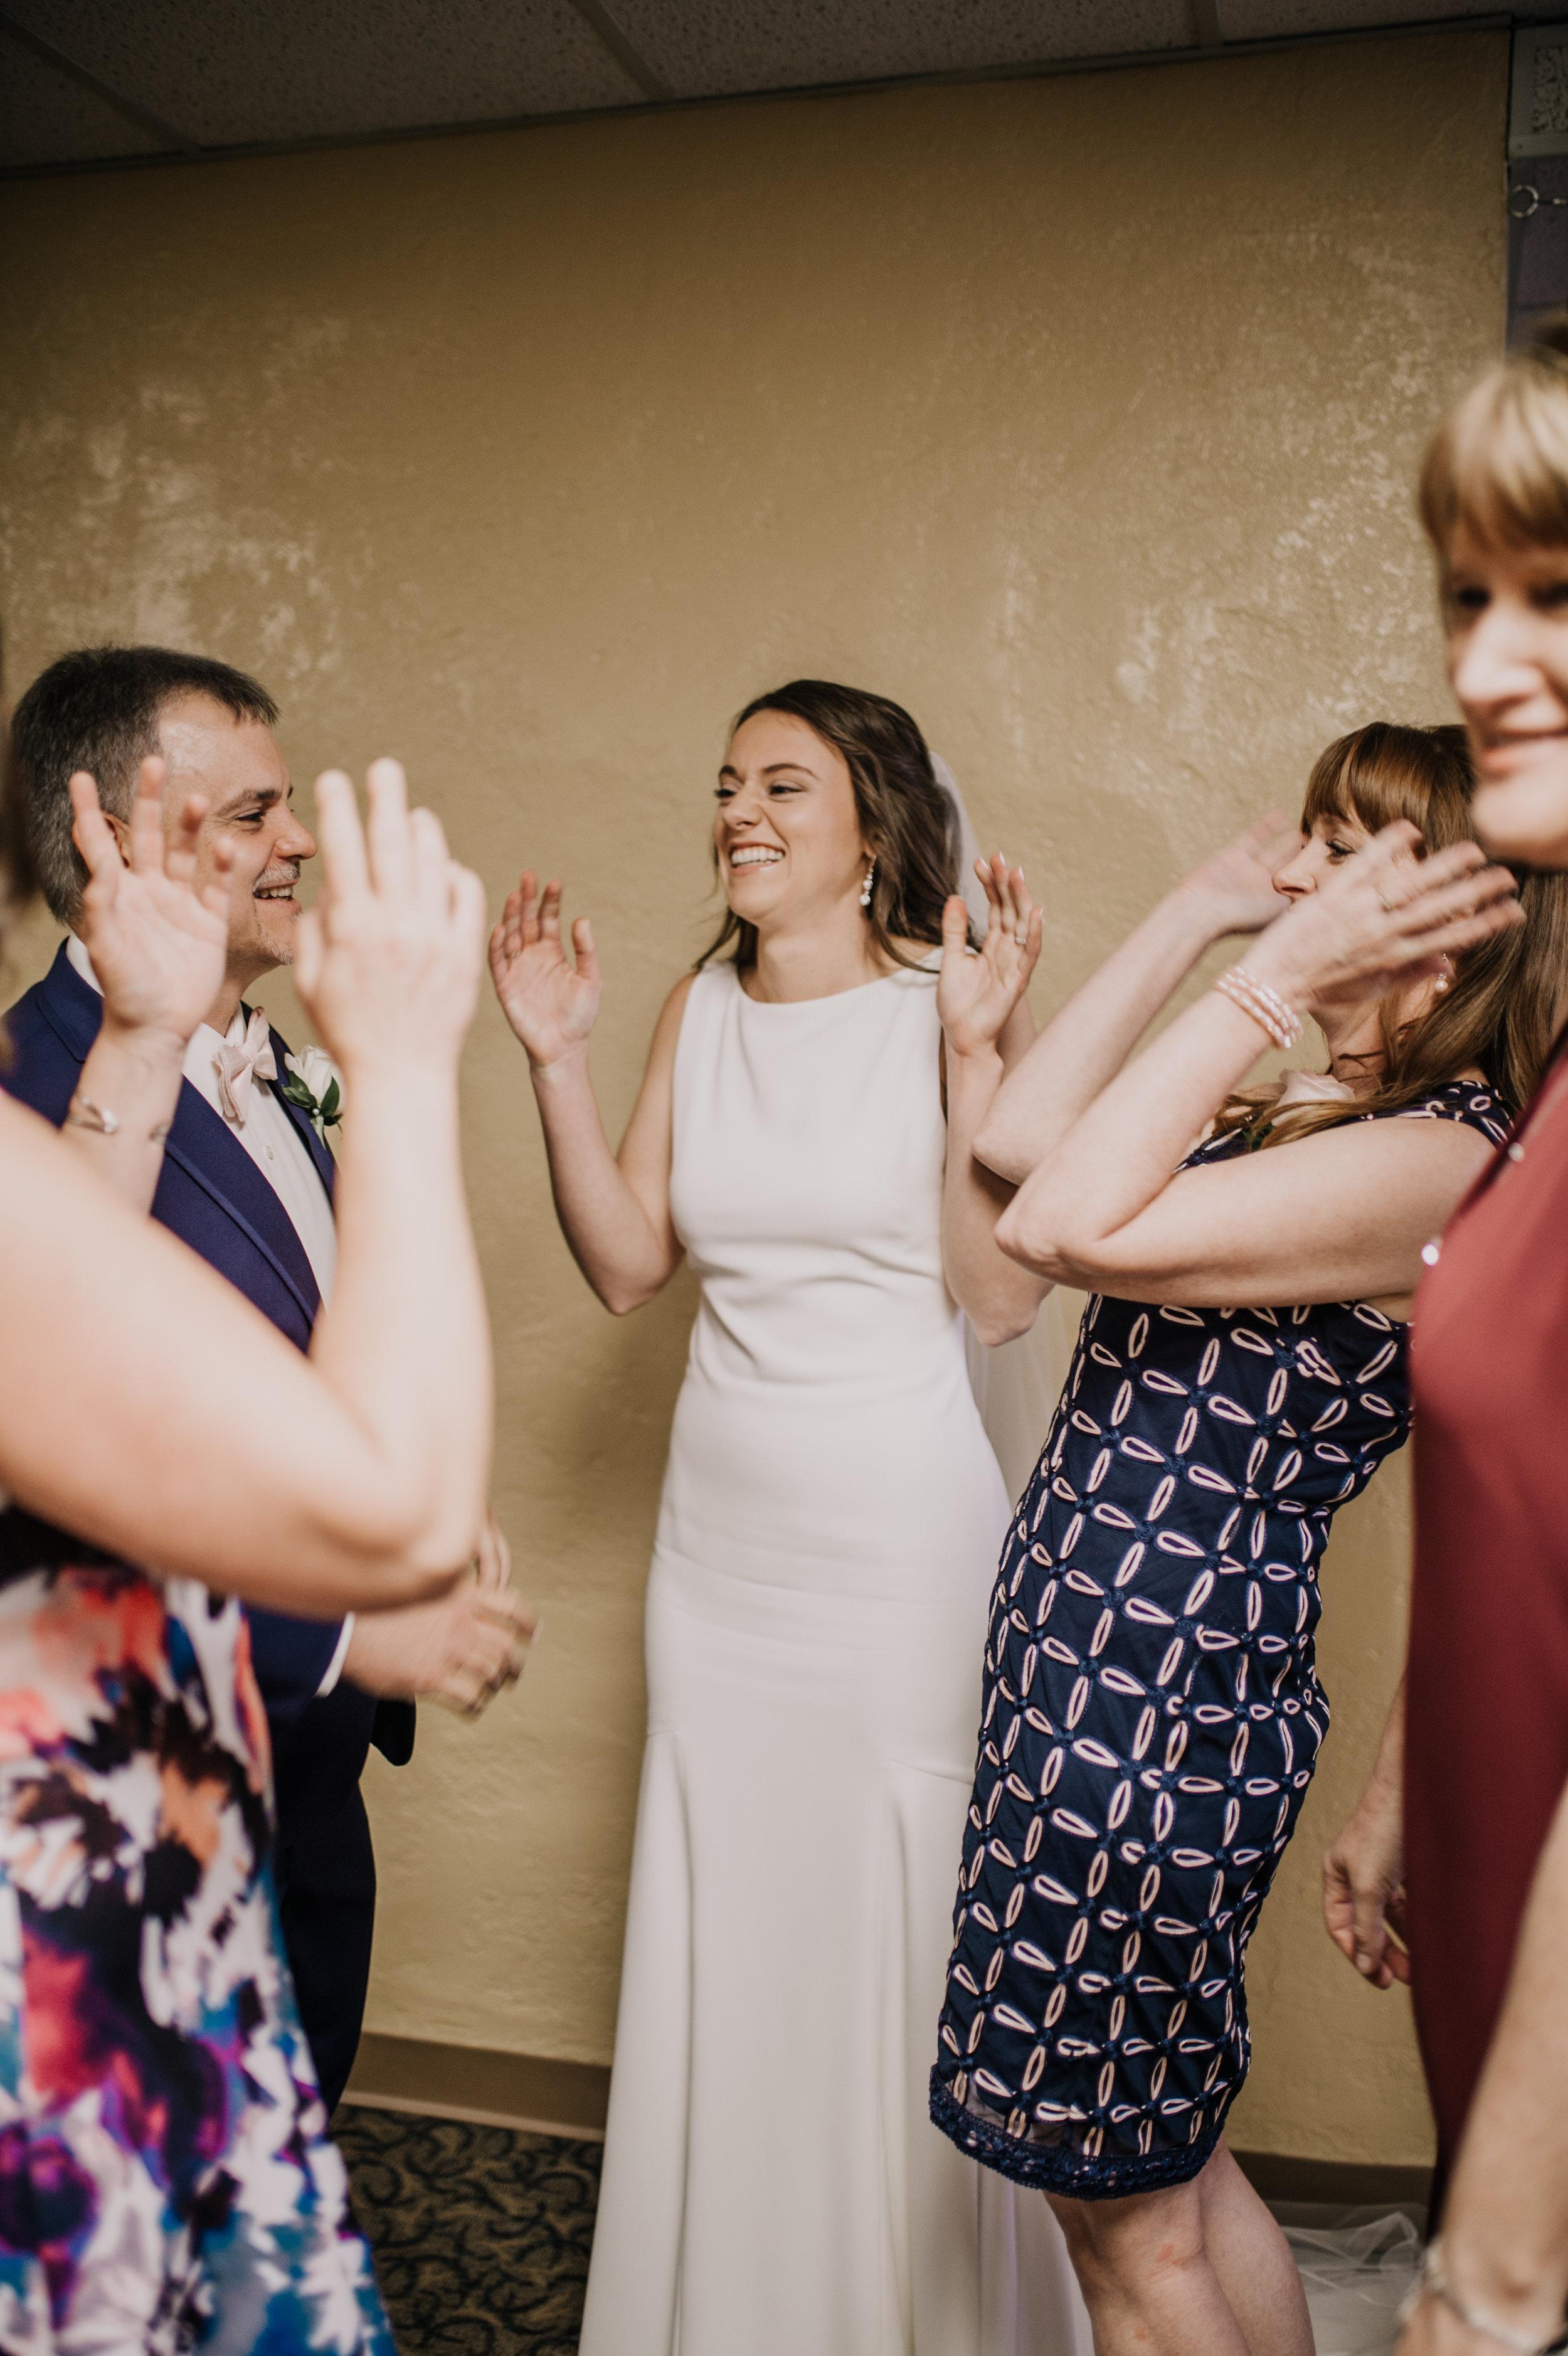 206 Montana Wedding Photographer_St. Francis Wedding_Tifani Zanto + Ryan Burke -6525.jpg